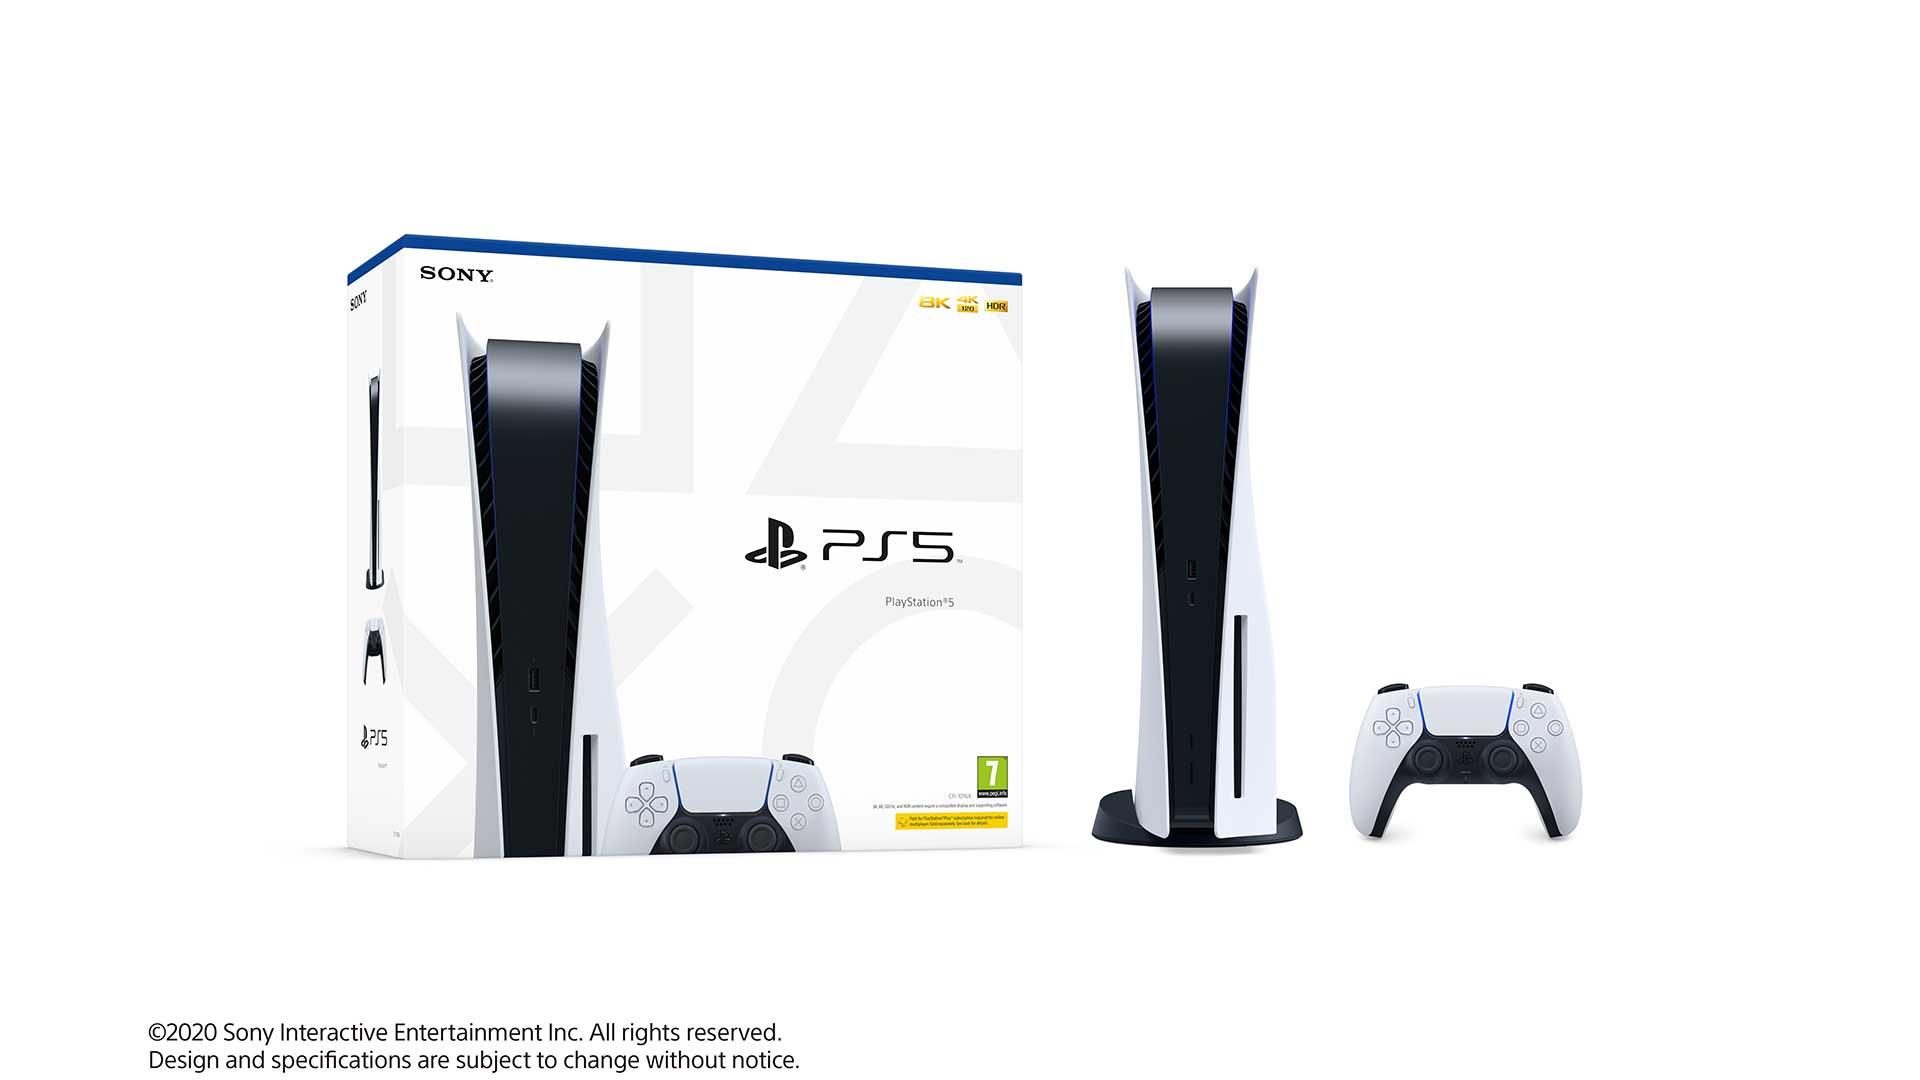 PS5 LAUNCH RNDR UK FL W PRODUCT 02 babt